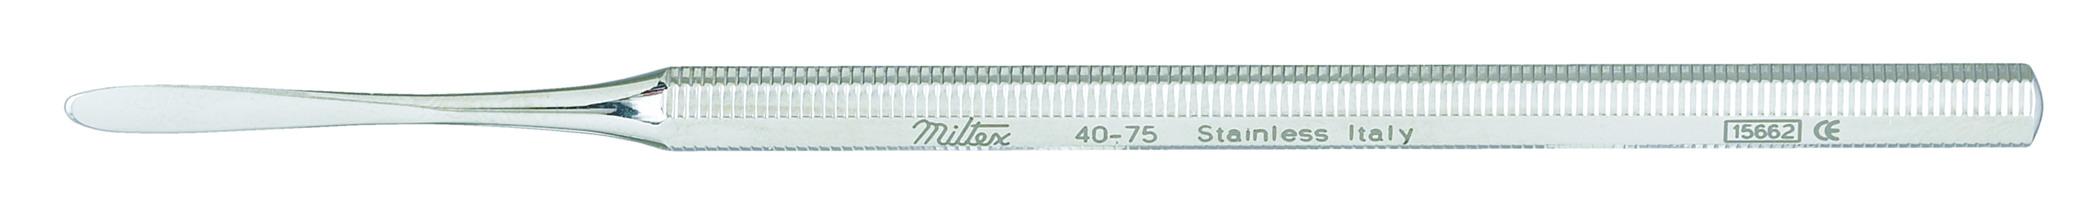 nucleus-knife-4-mm-40-75-miltex.jpg